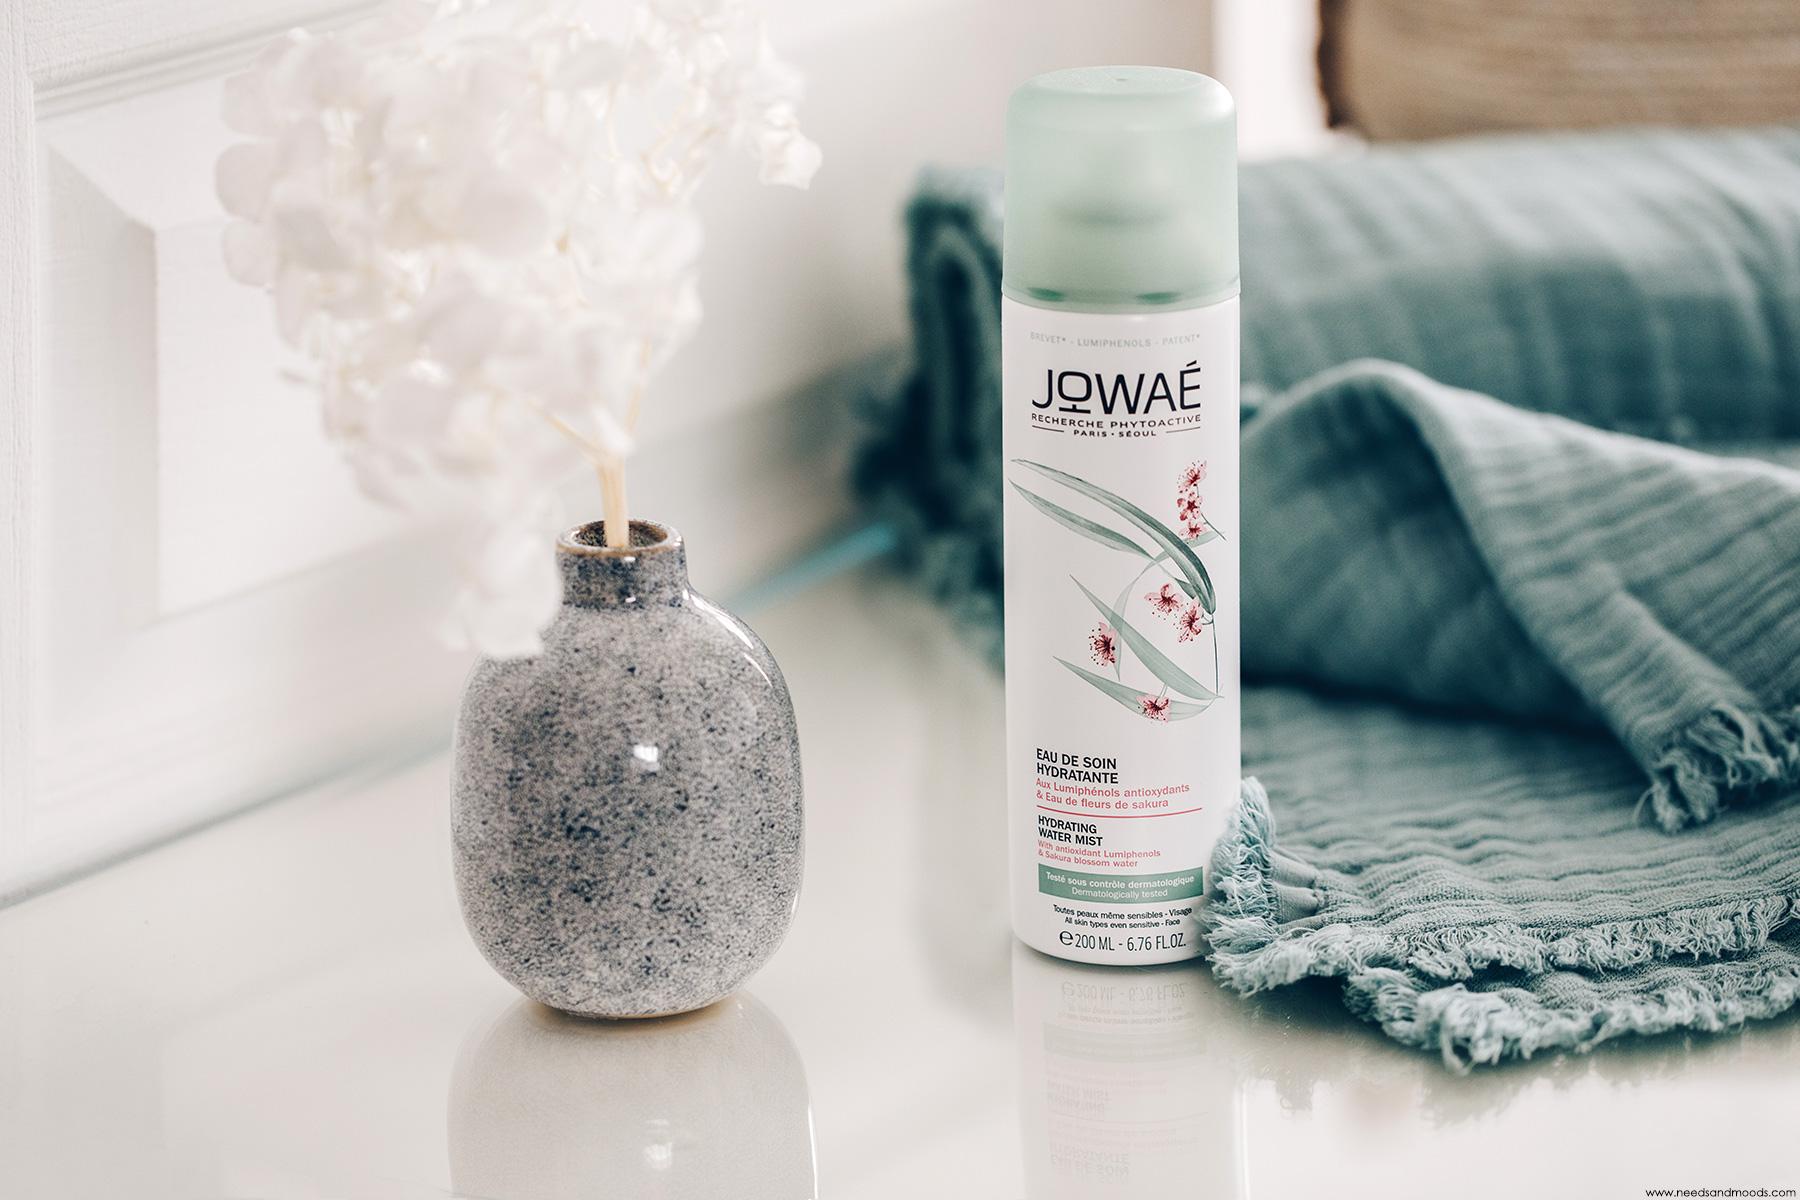 jowae avis eau soin hydratante